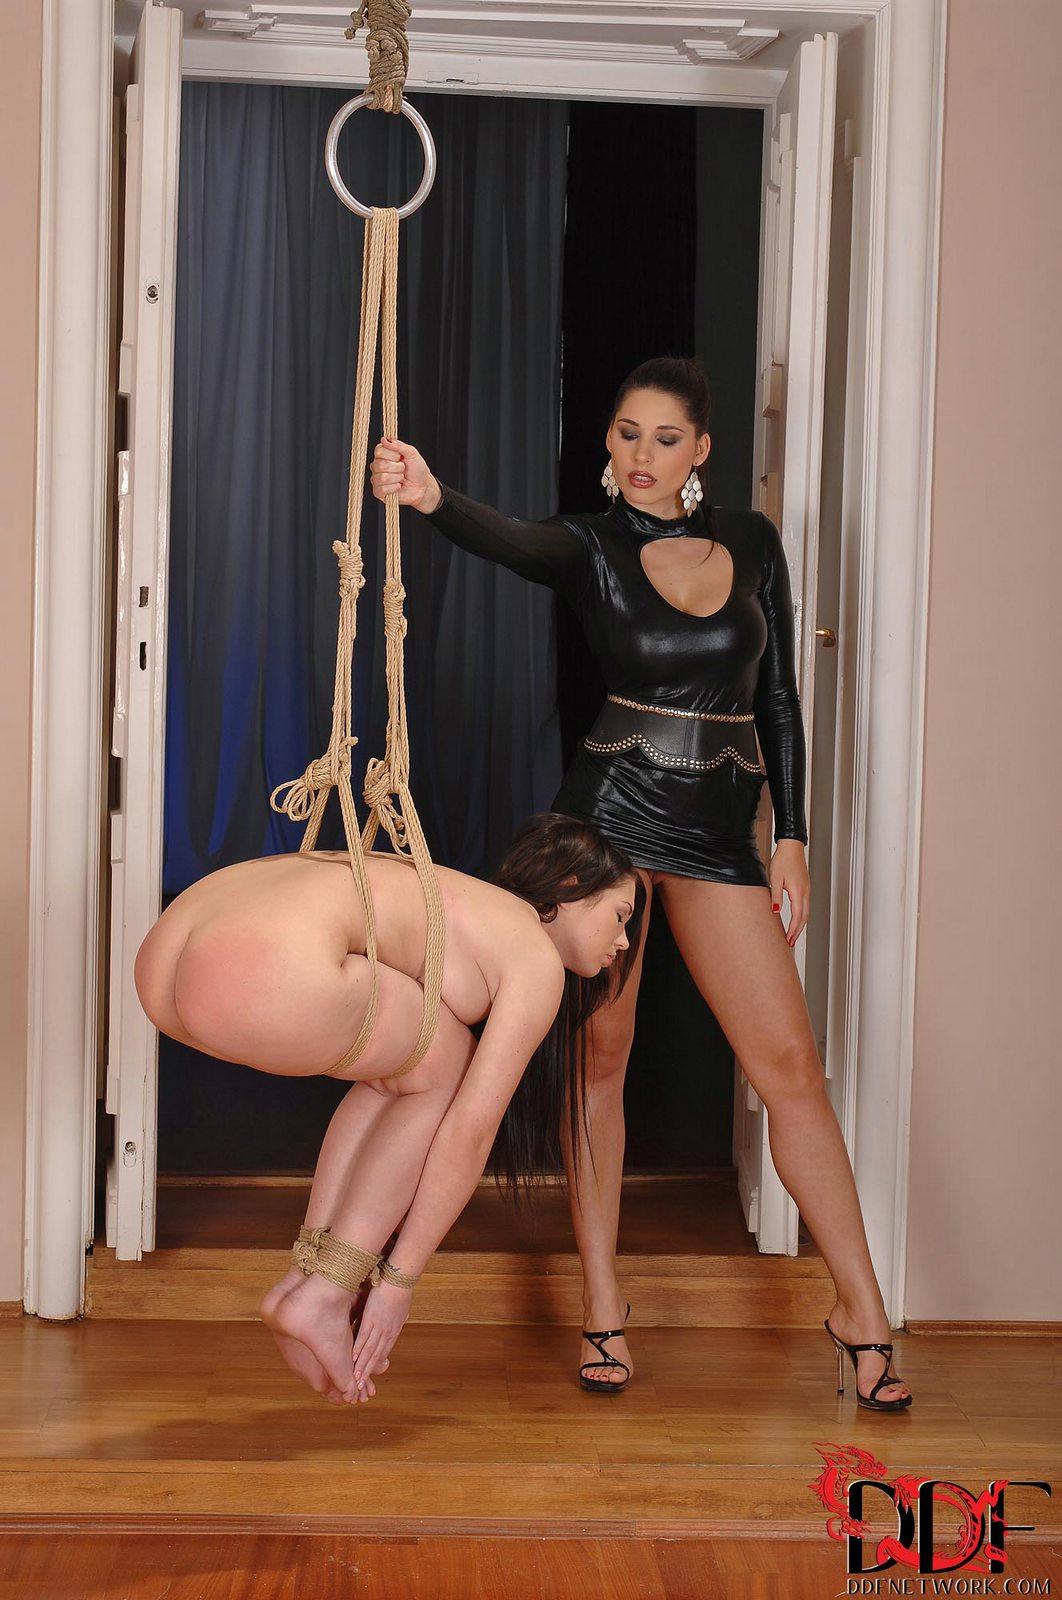 Classy mistress Zafira punishing her slave girl Antonia W ...